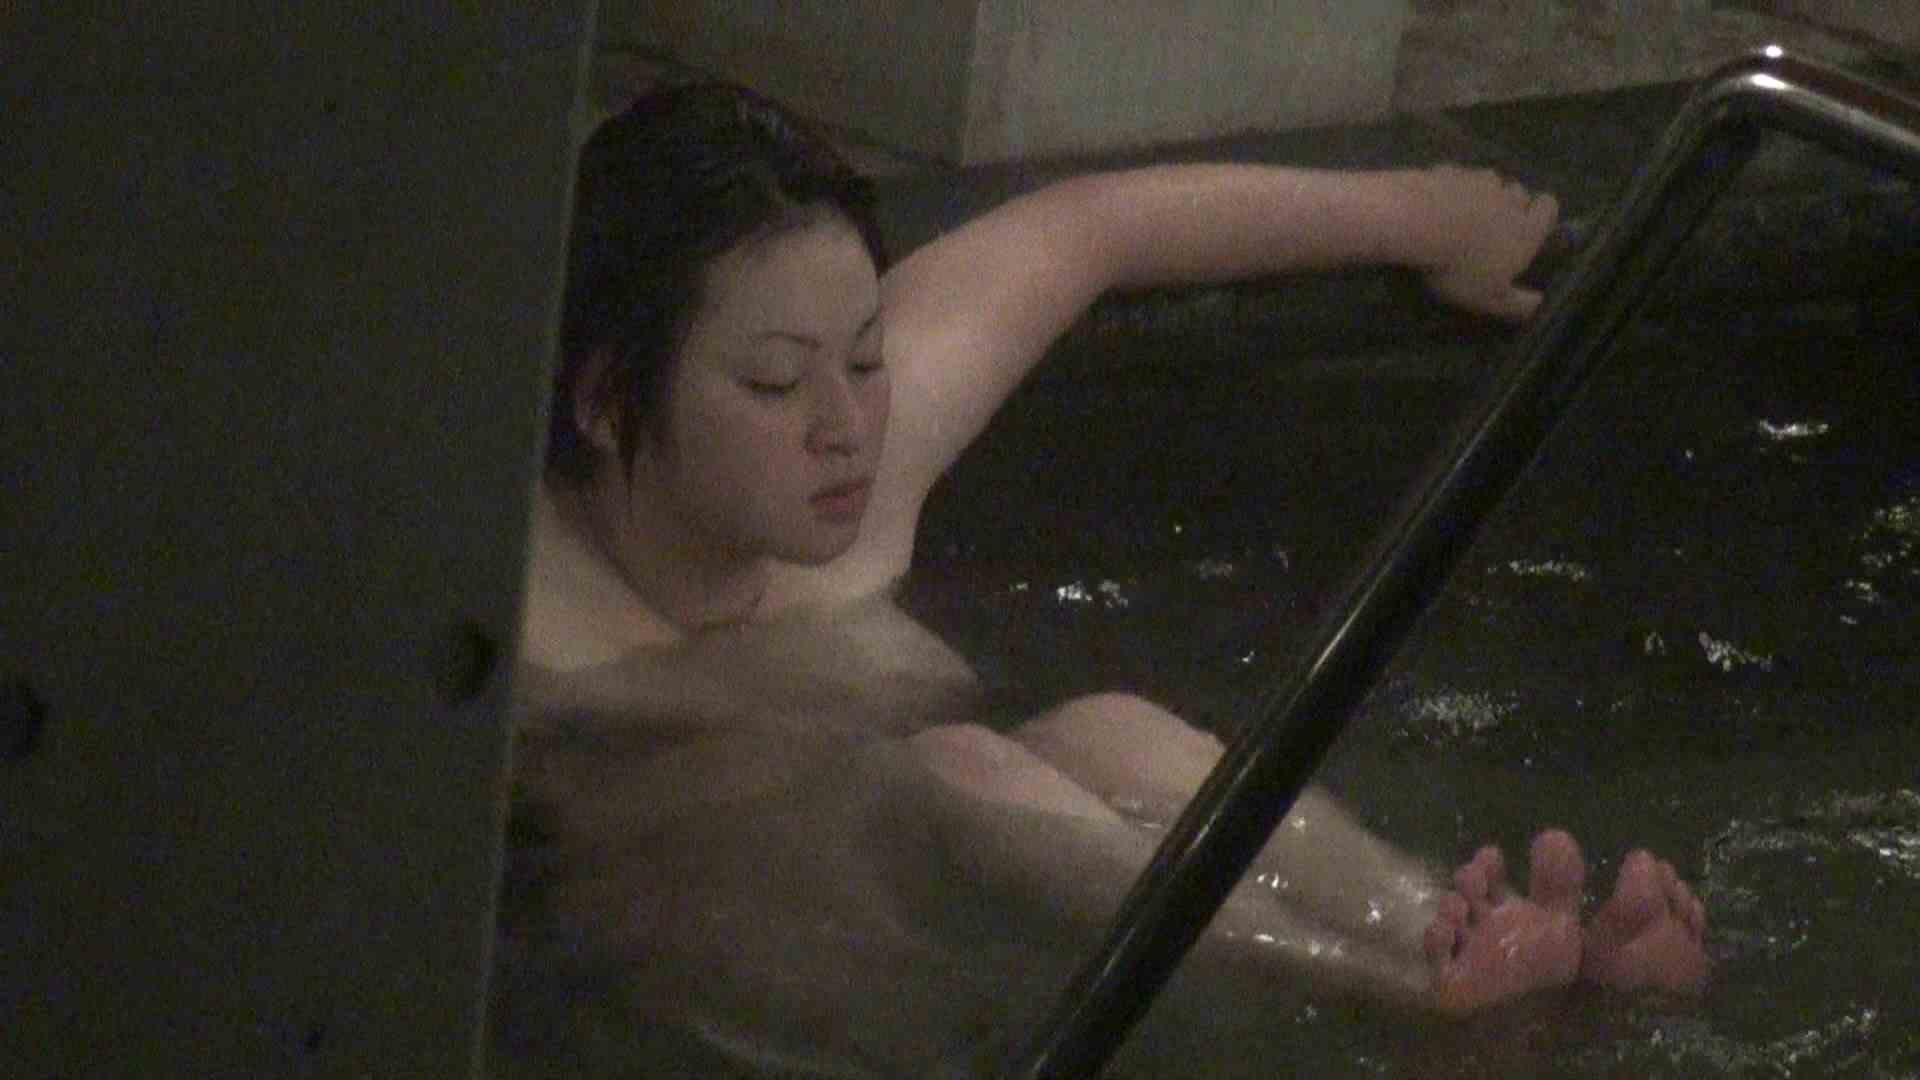 Aquaな露天風呂Vol.338 露天風呂編  82PIX 68